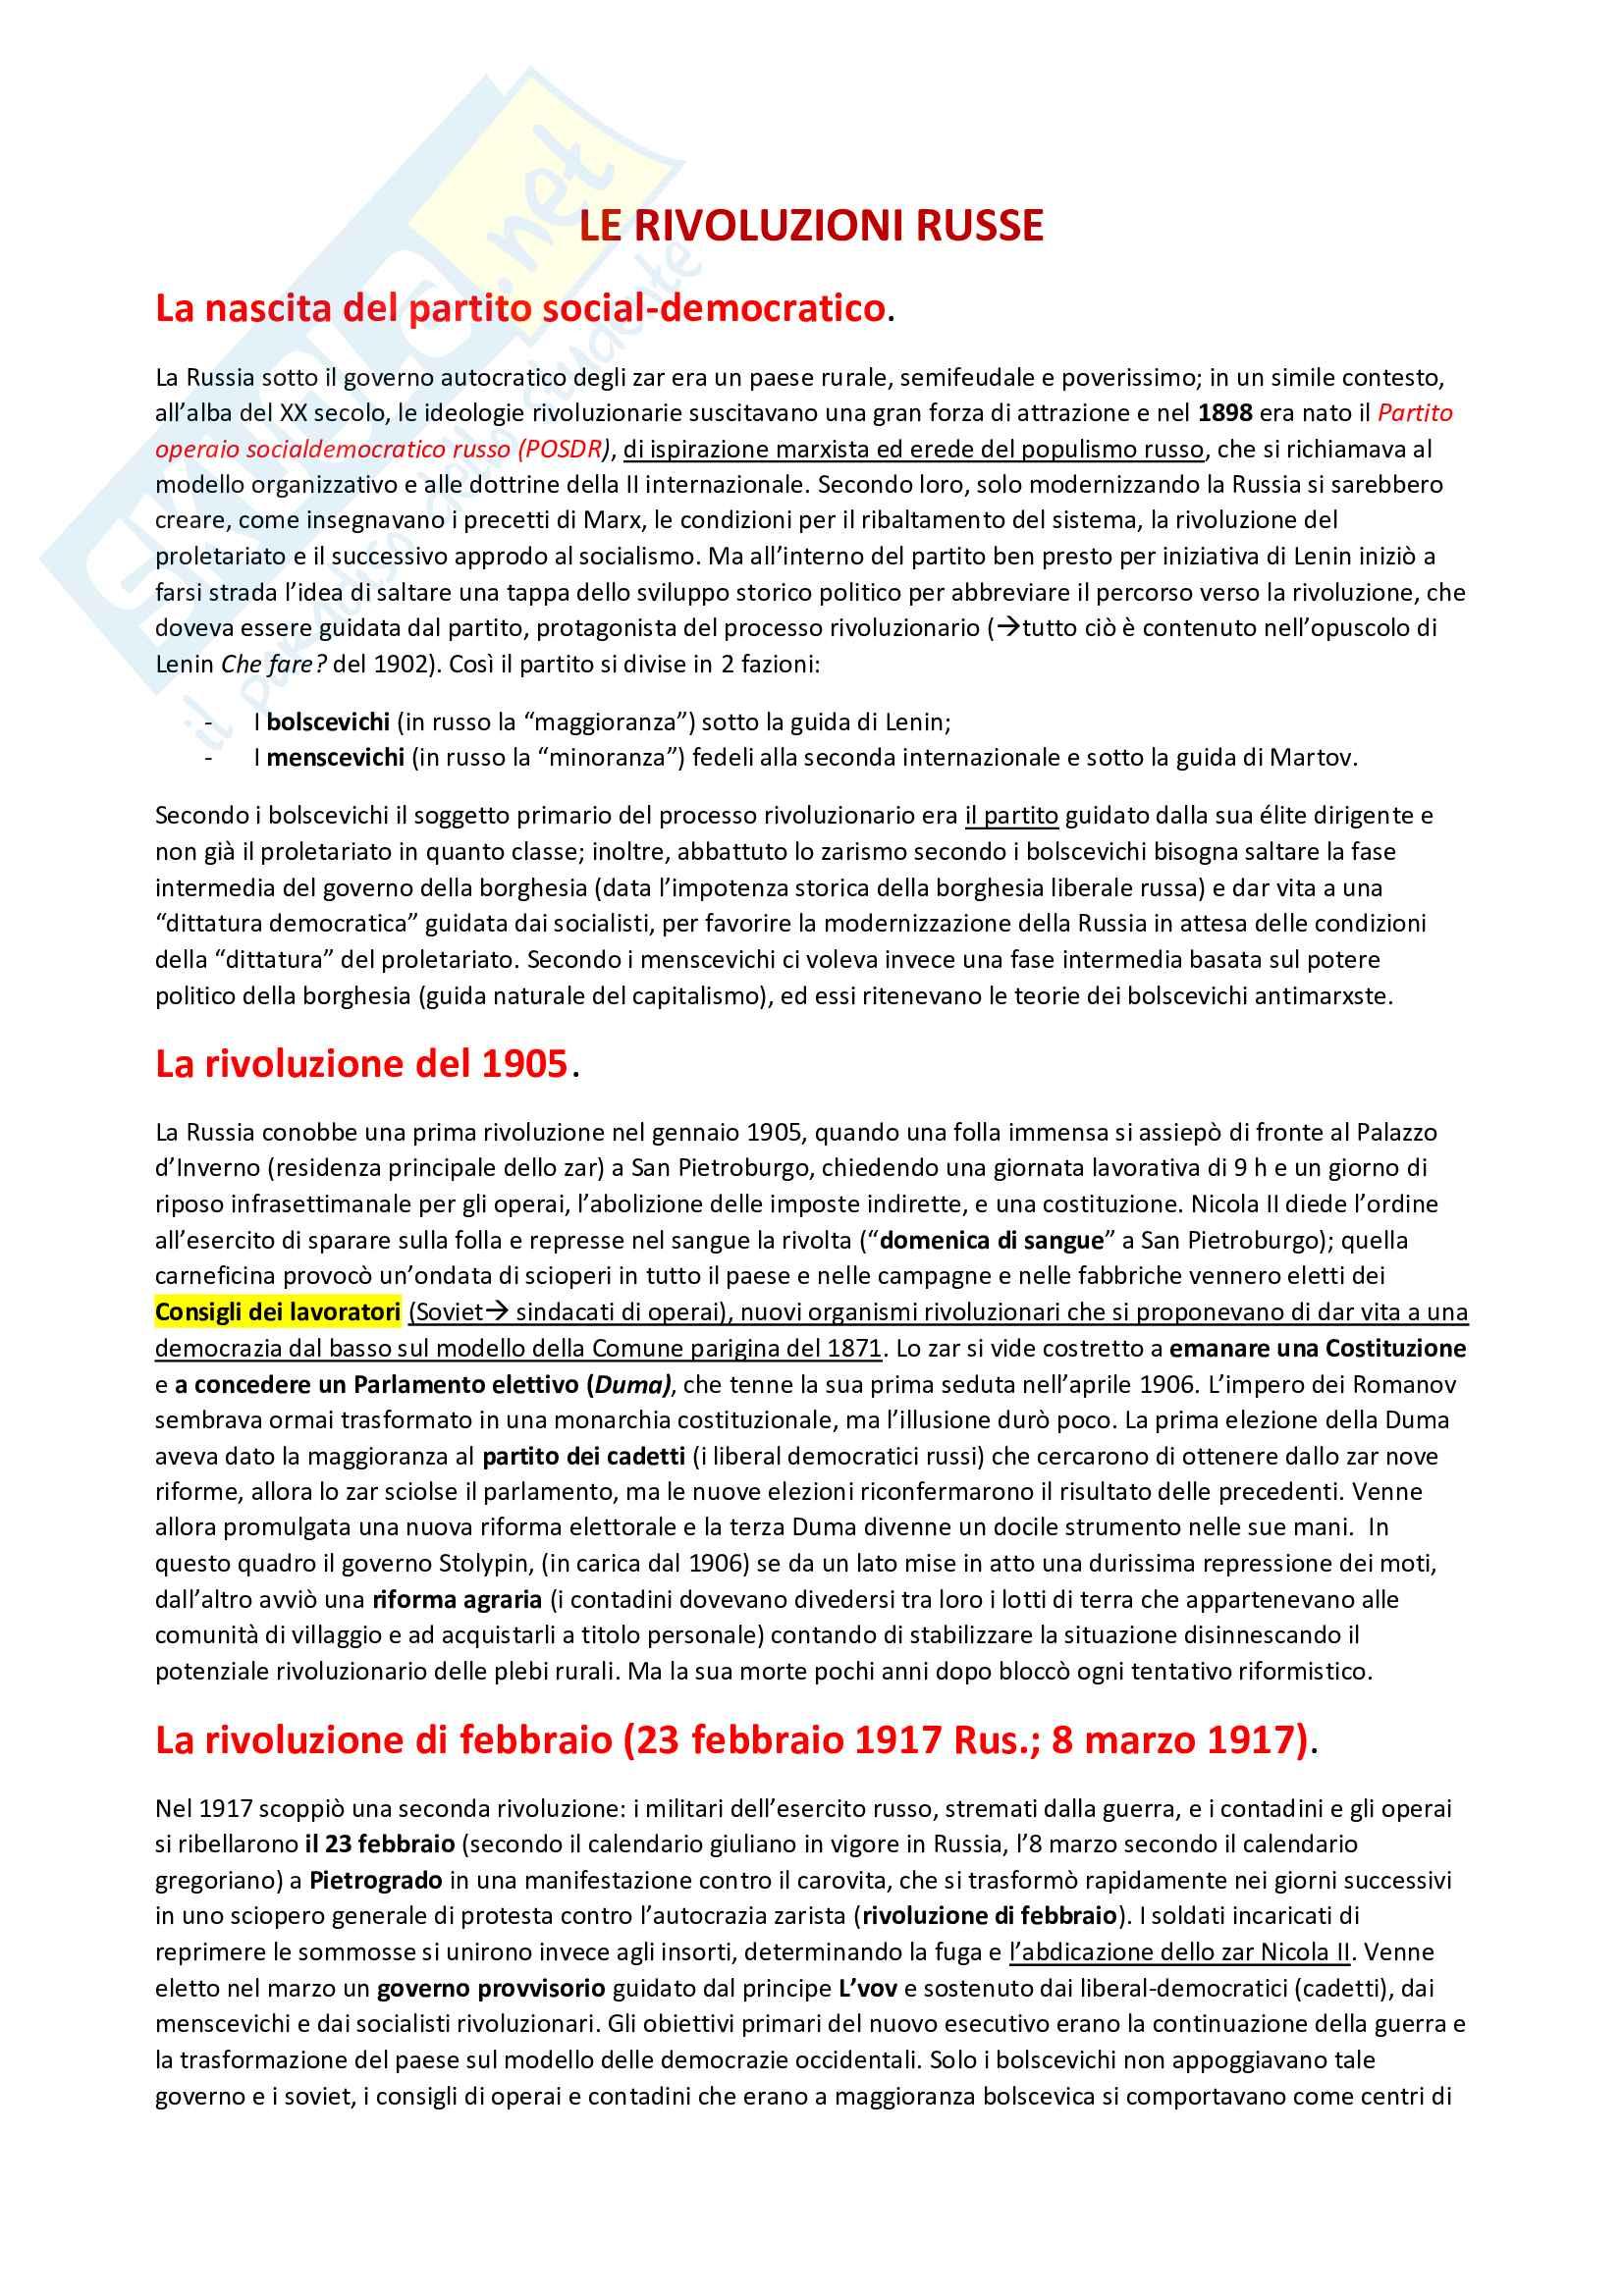 Riassunto Rivoluzione russa, Lenin, Stalin - storia contemporanea, sintesi